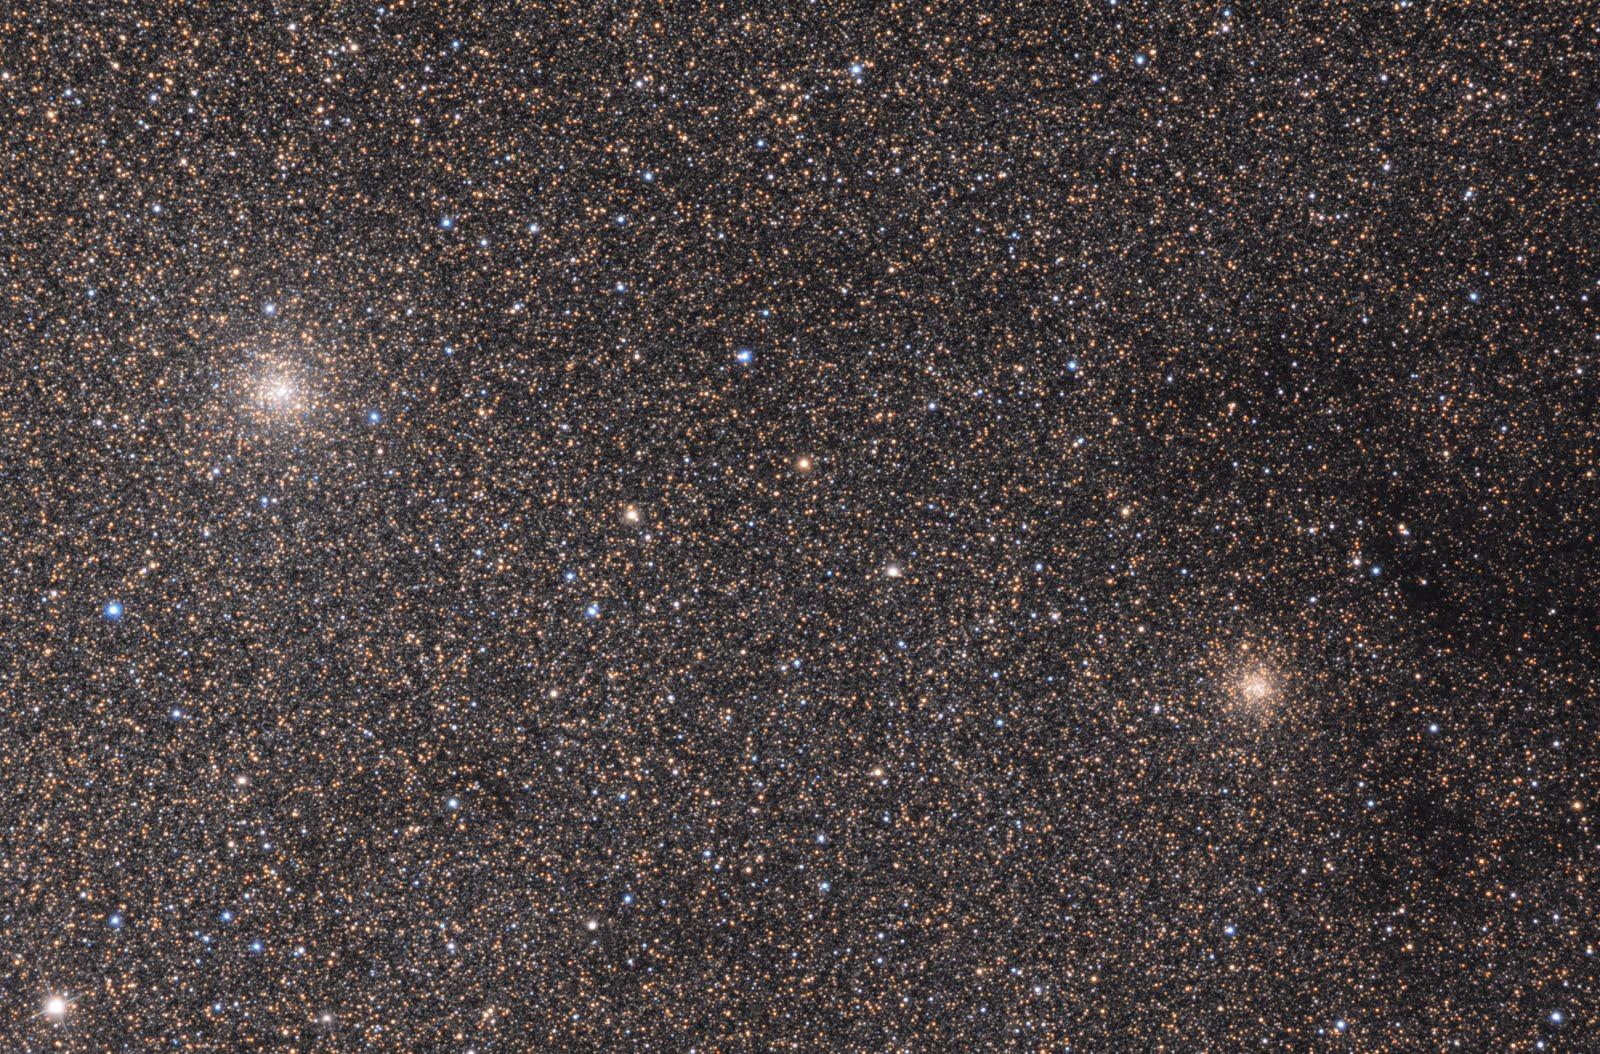 Ammassi globulari nel bulbo della Via Lattea